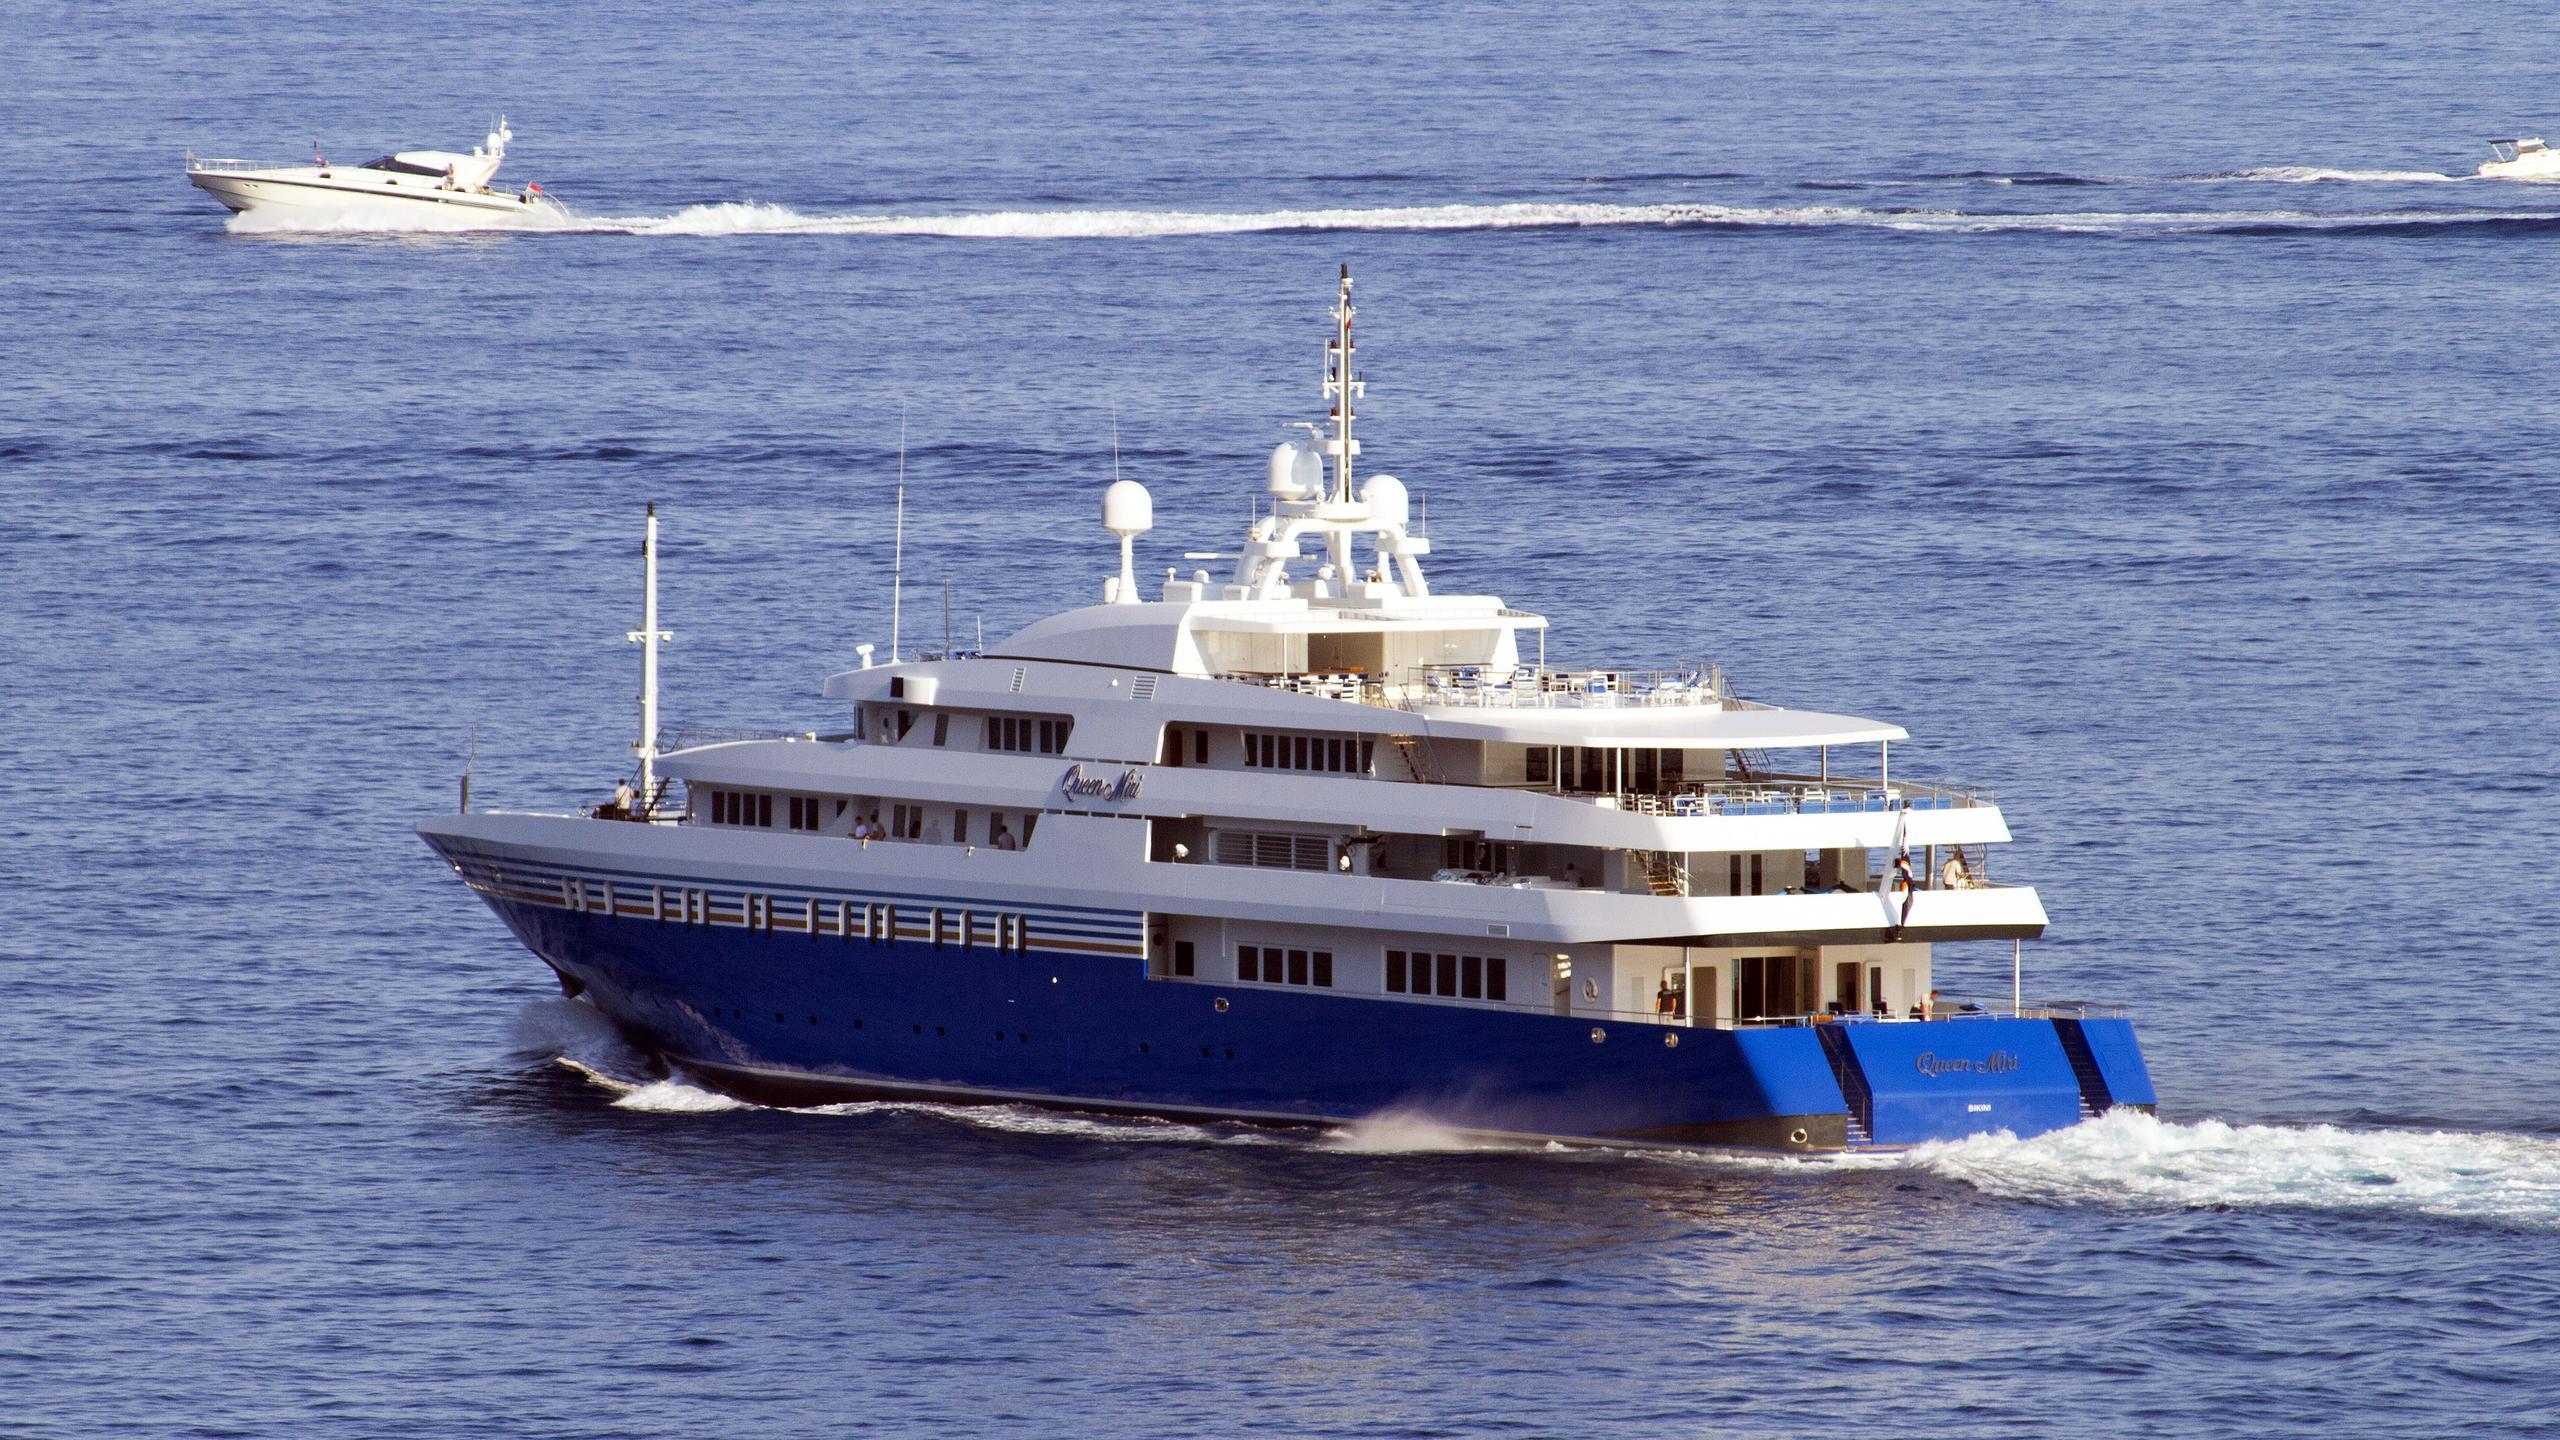 queen-miri-motor-yacht-neorion-2004-91m-running-half-stern